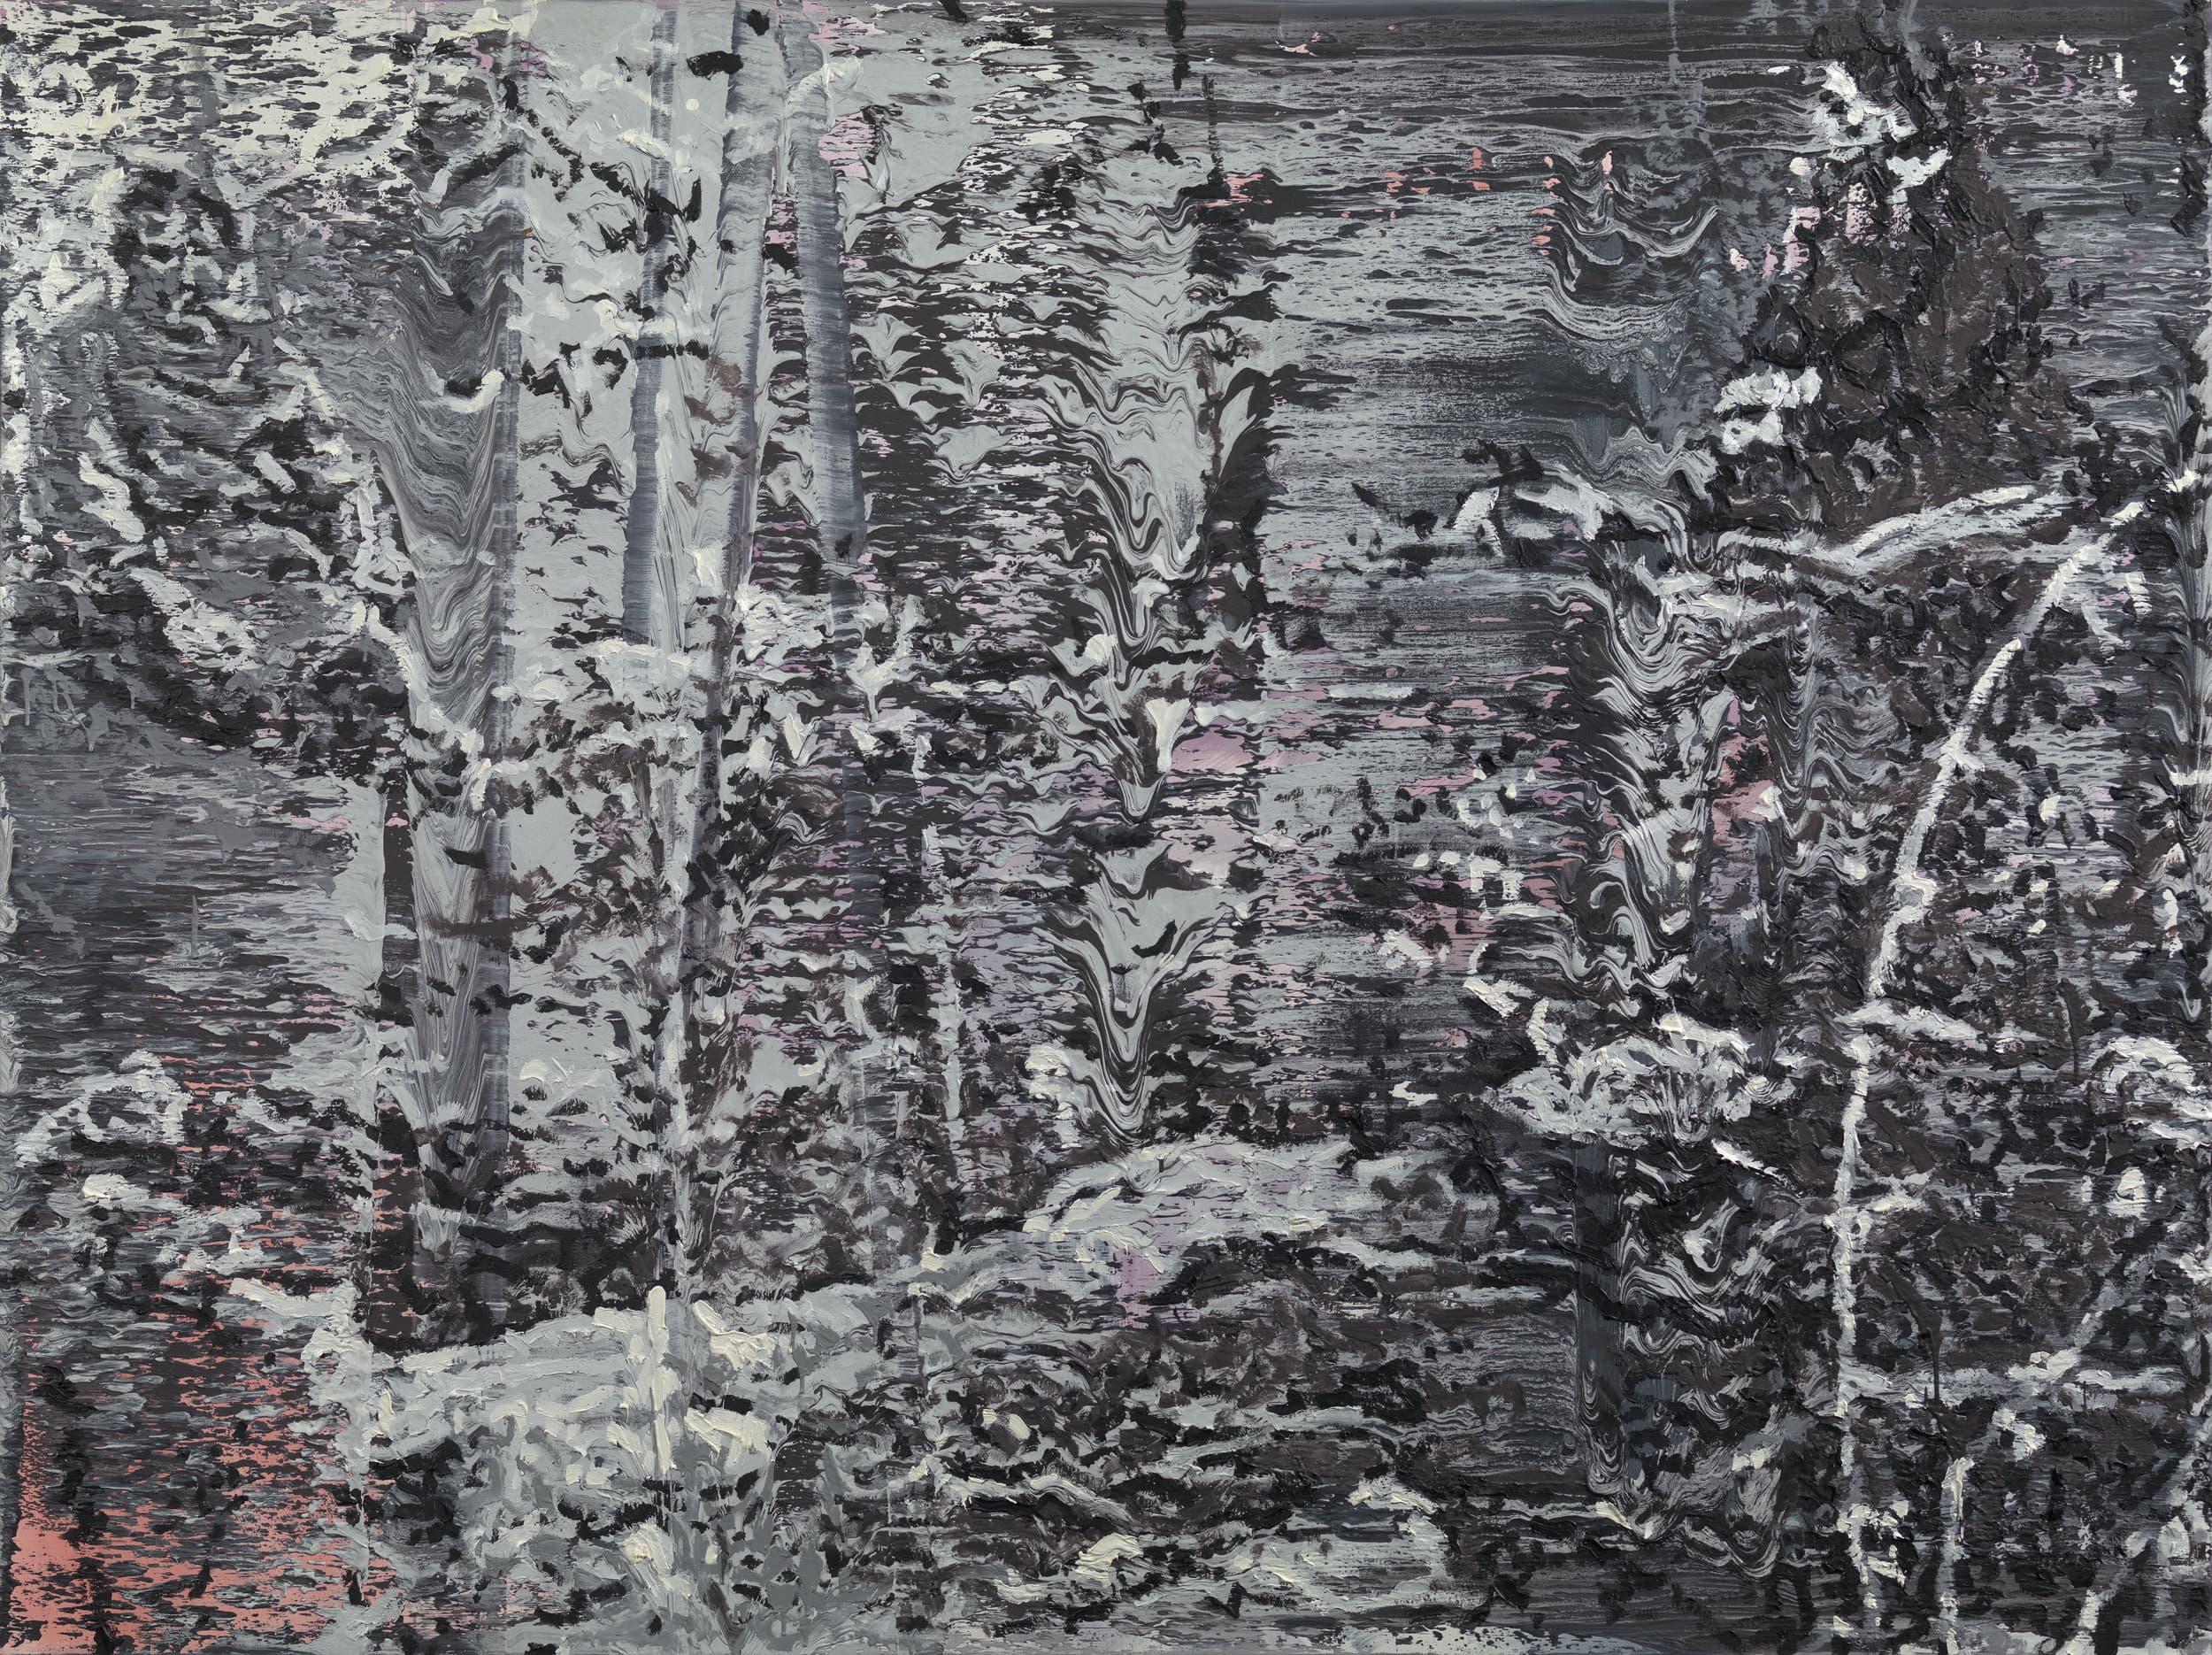 Marzabotto 1944 Historical Nostagia Series 2016, mixed media, 150x200cm